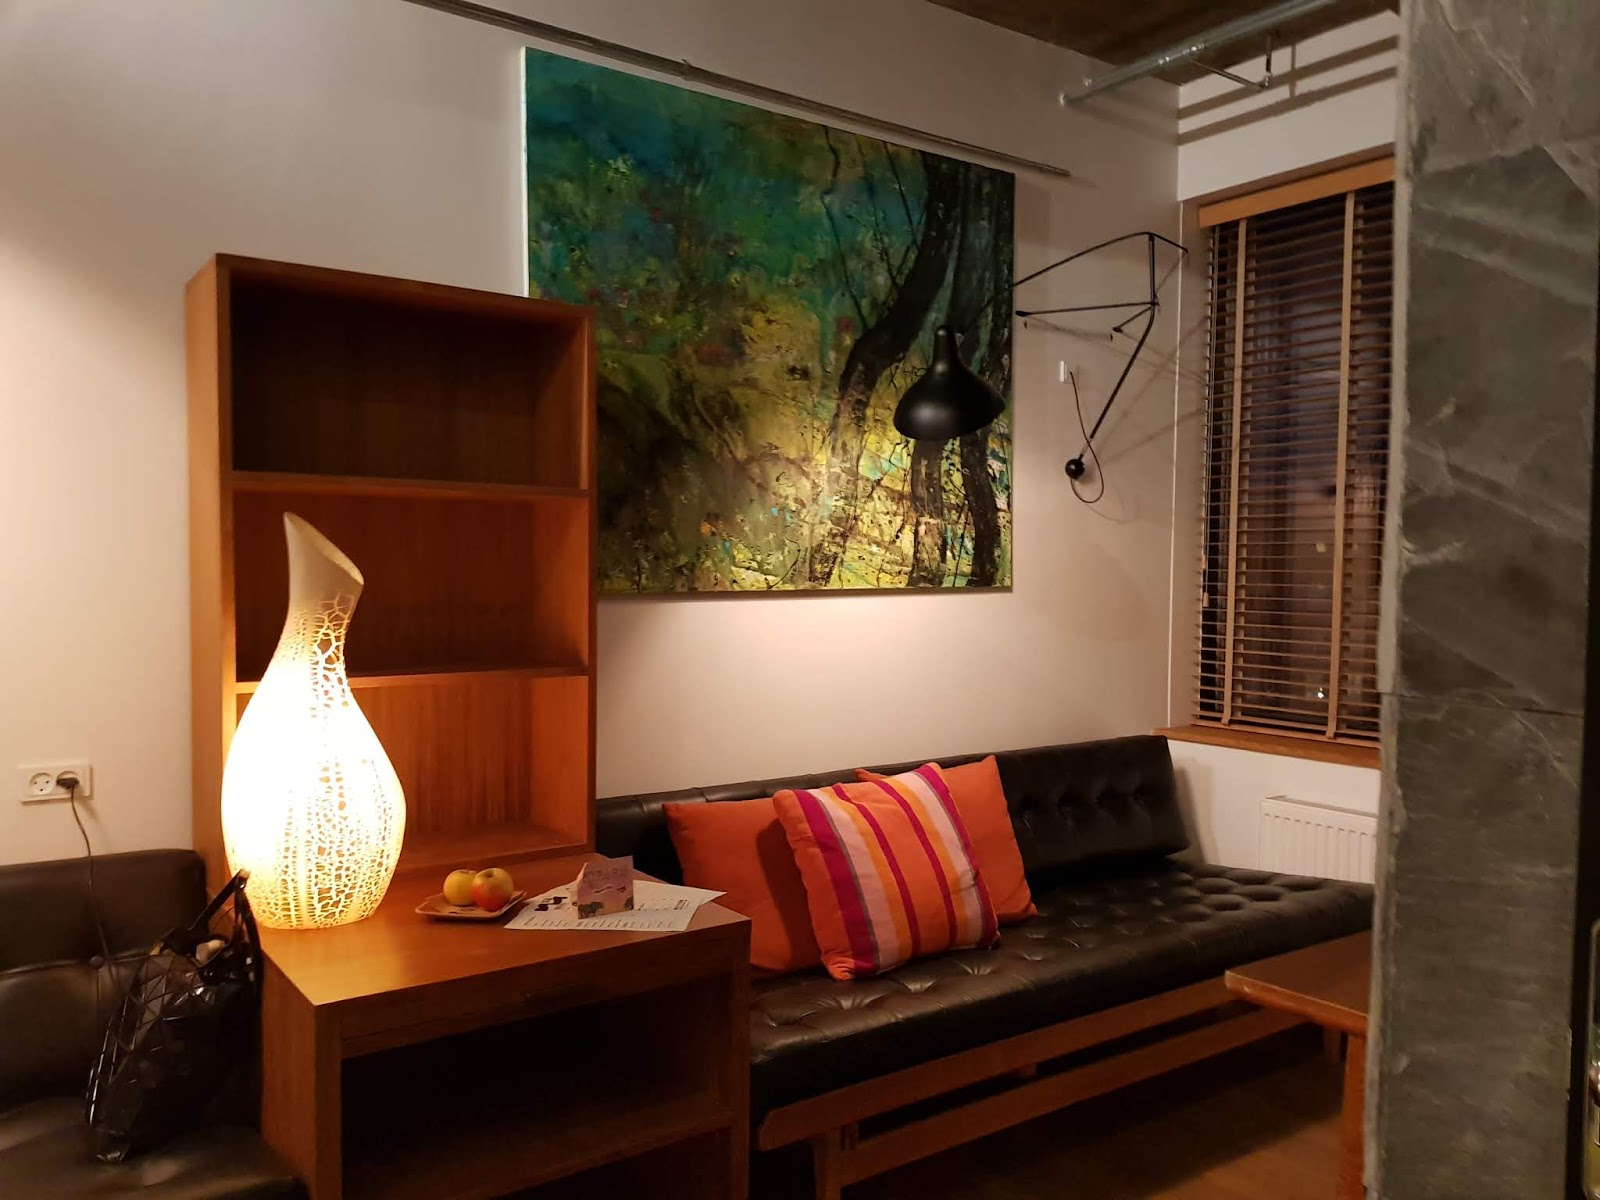 Manon Les Suites Hotel Room Review - Best eco friendly hotels in Copenhagen - Vegan travel blogger Copenhagen Guide.jpg